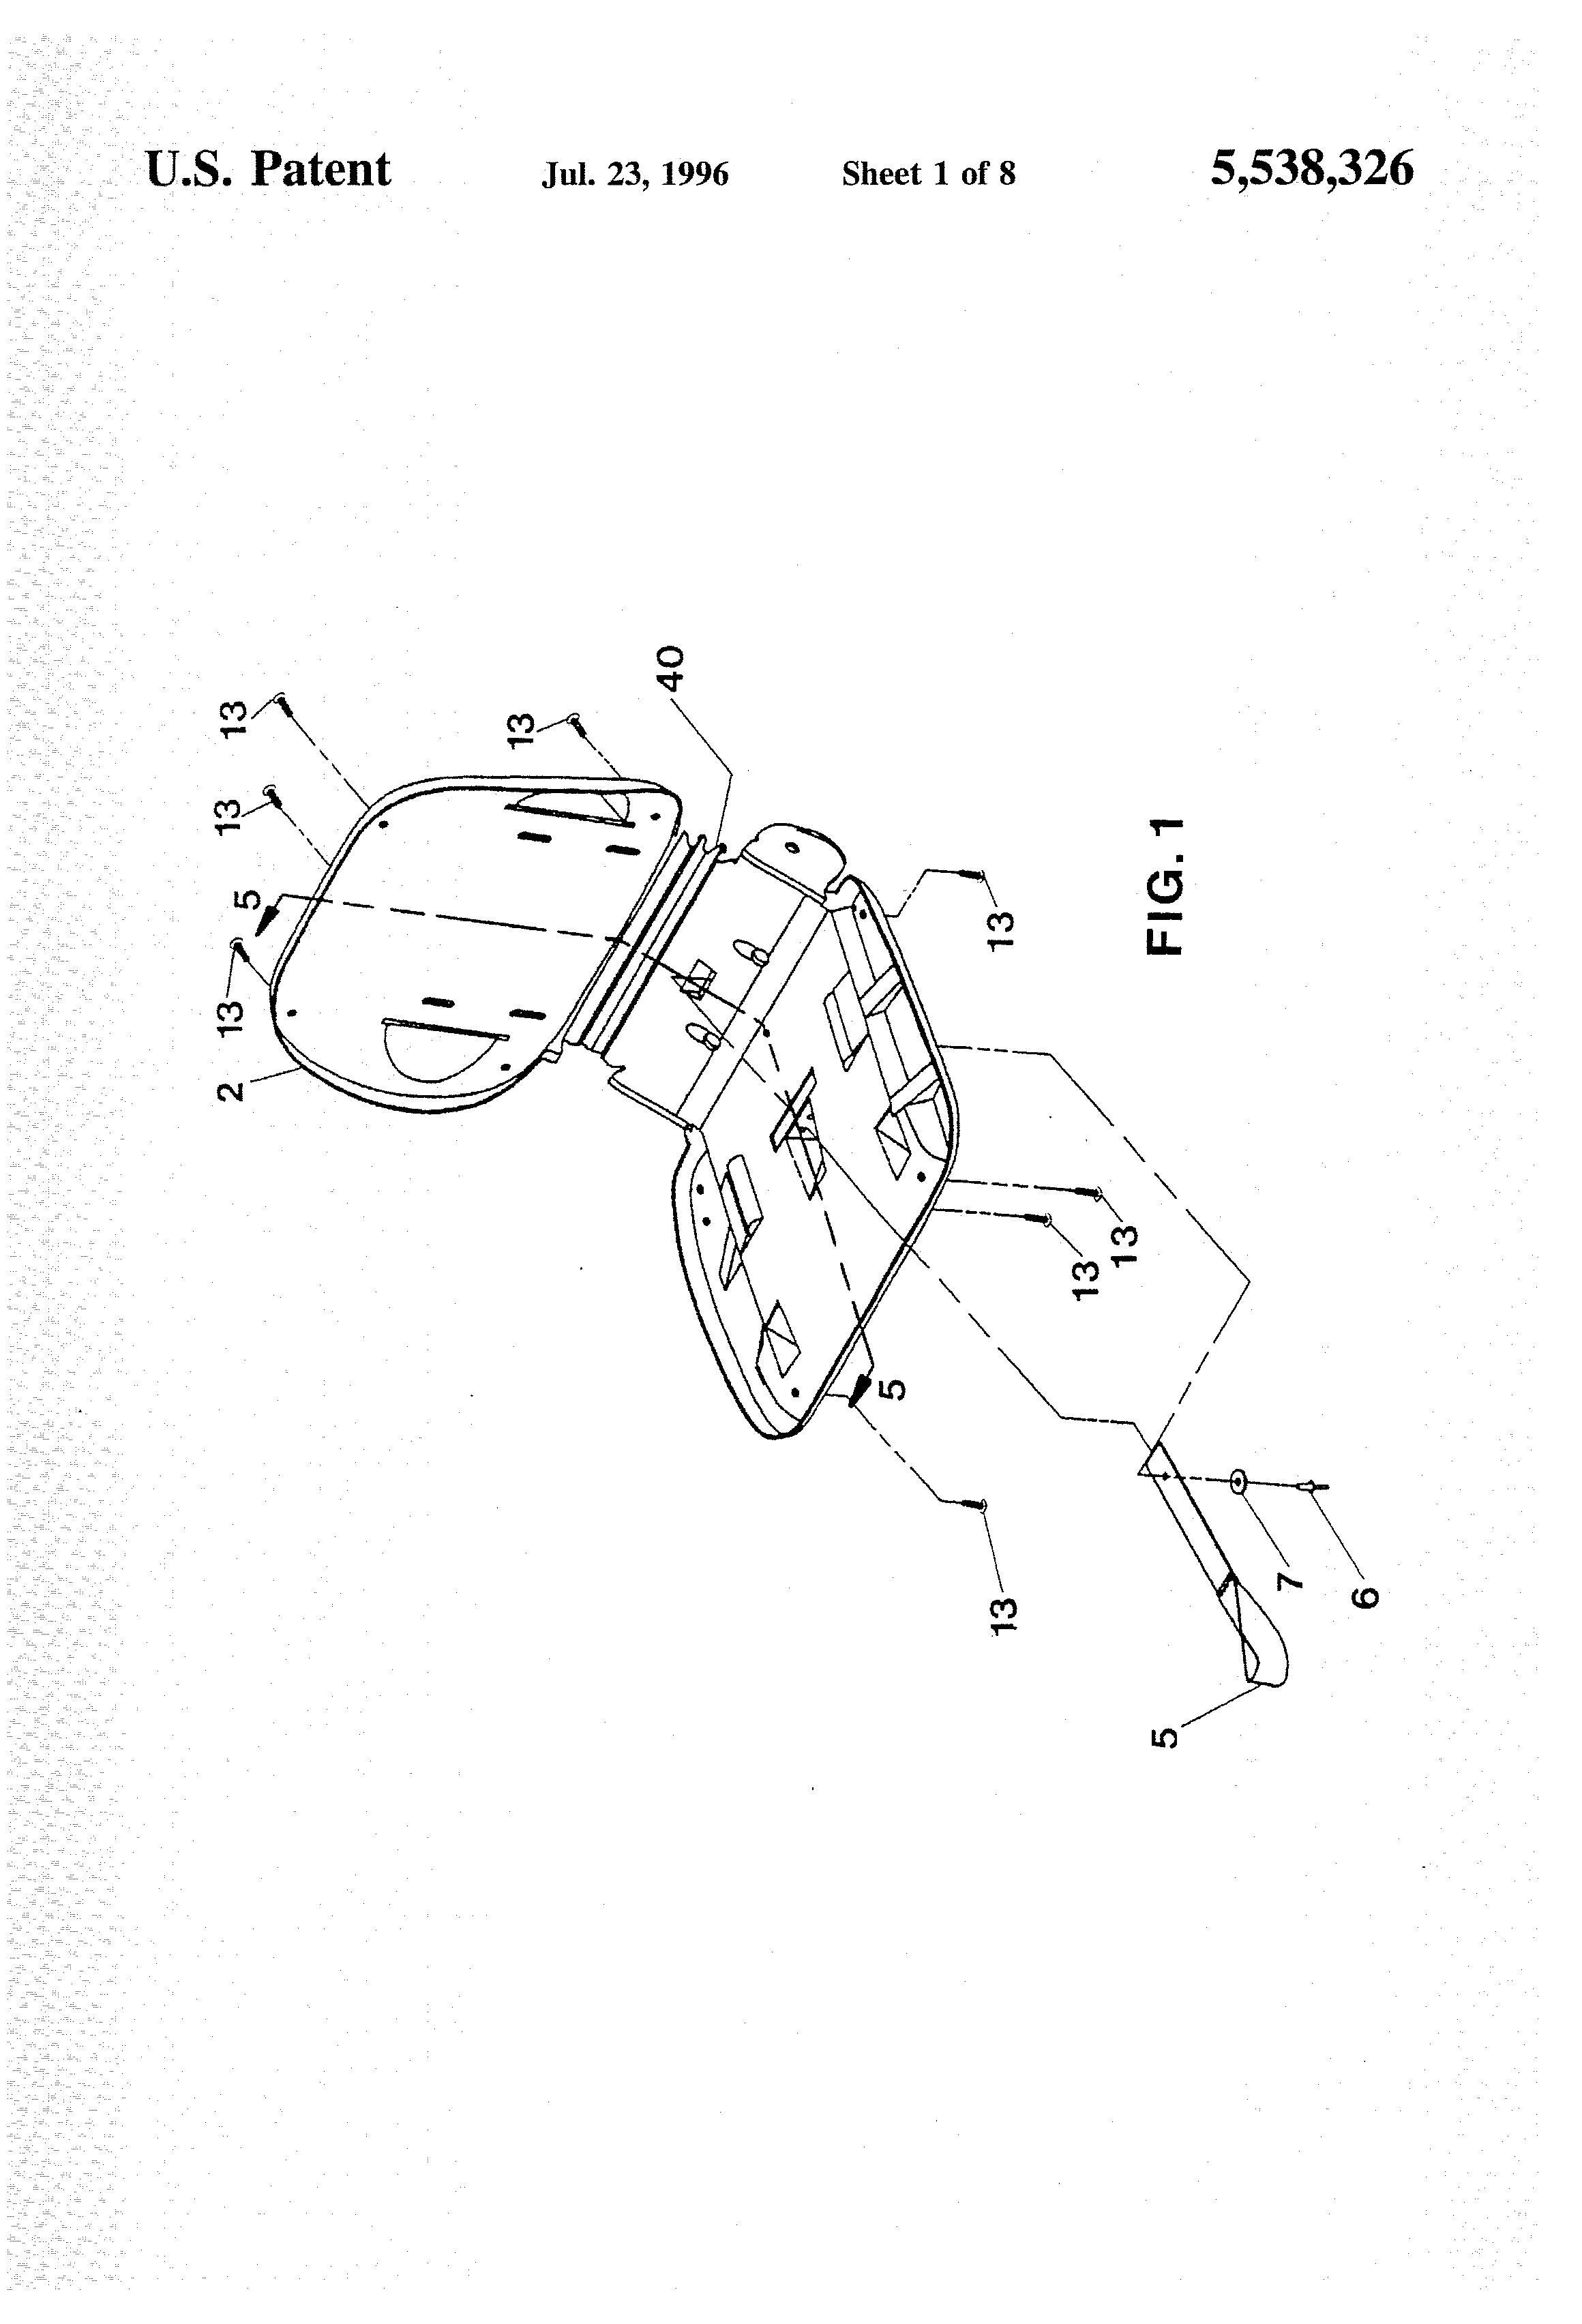 Milsco Seat Hardware : Patent us flexible unitary seat shell google